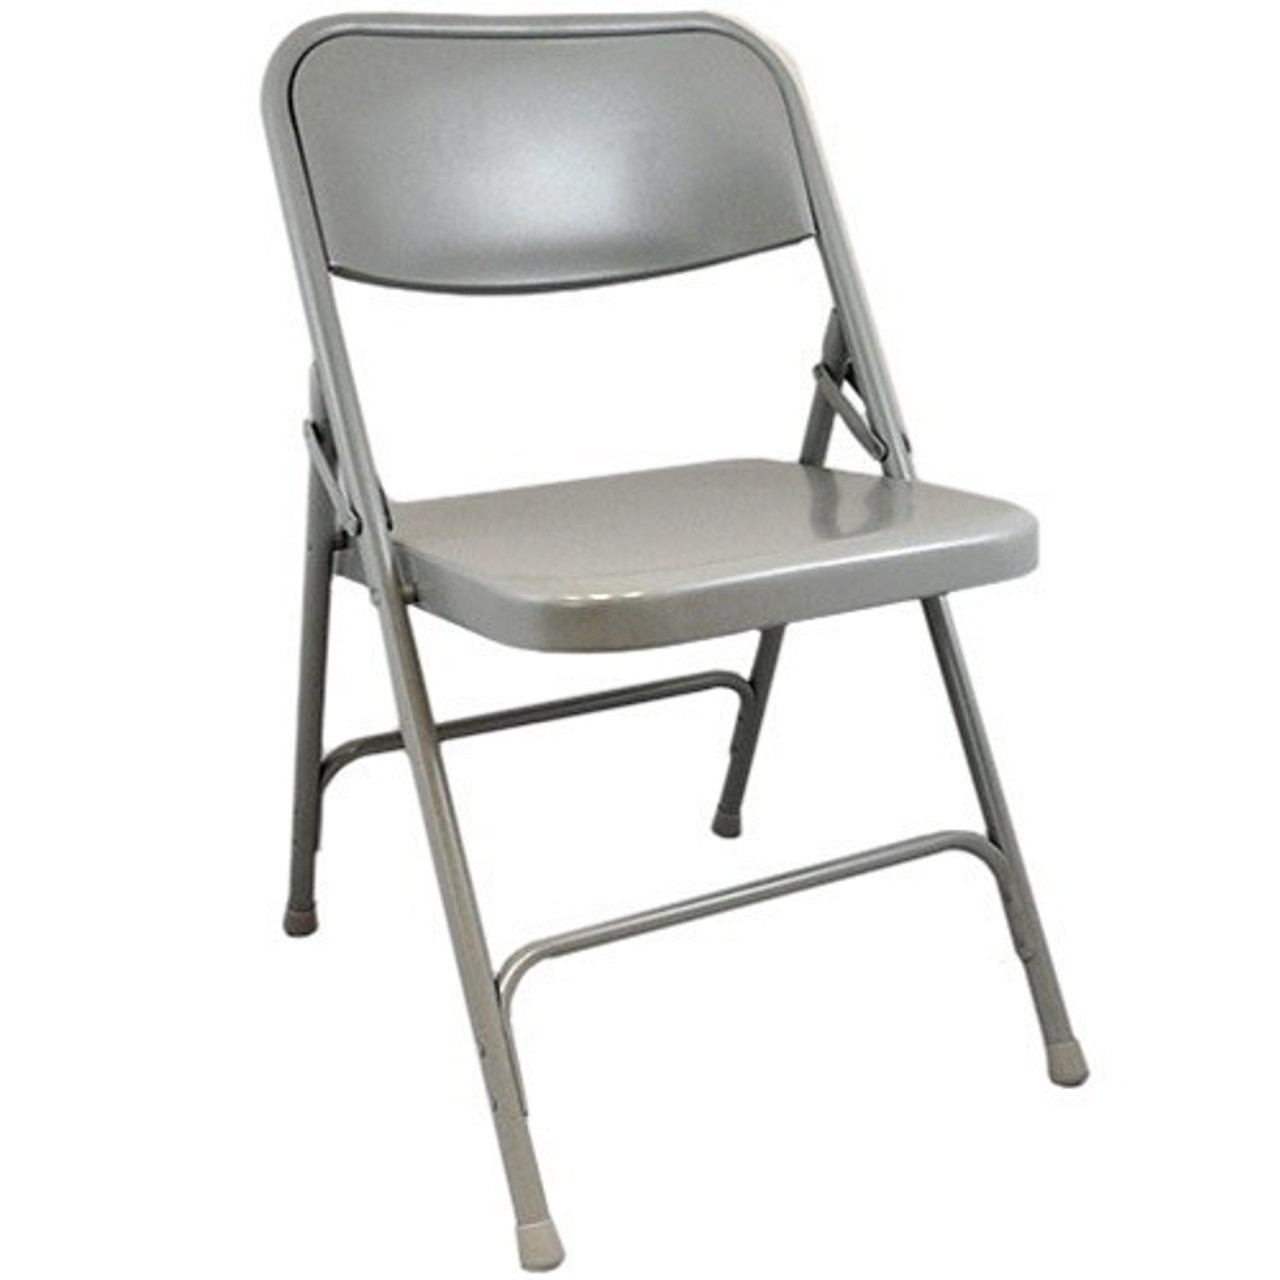 Trade Show Folding Chair Rentals 1